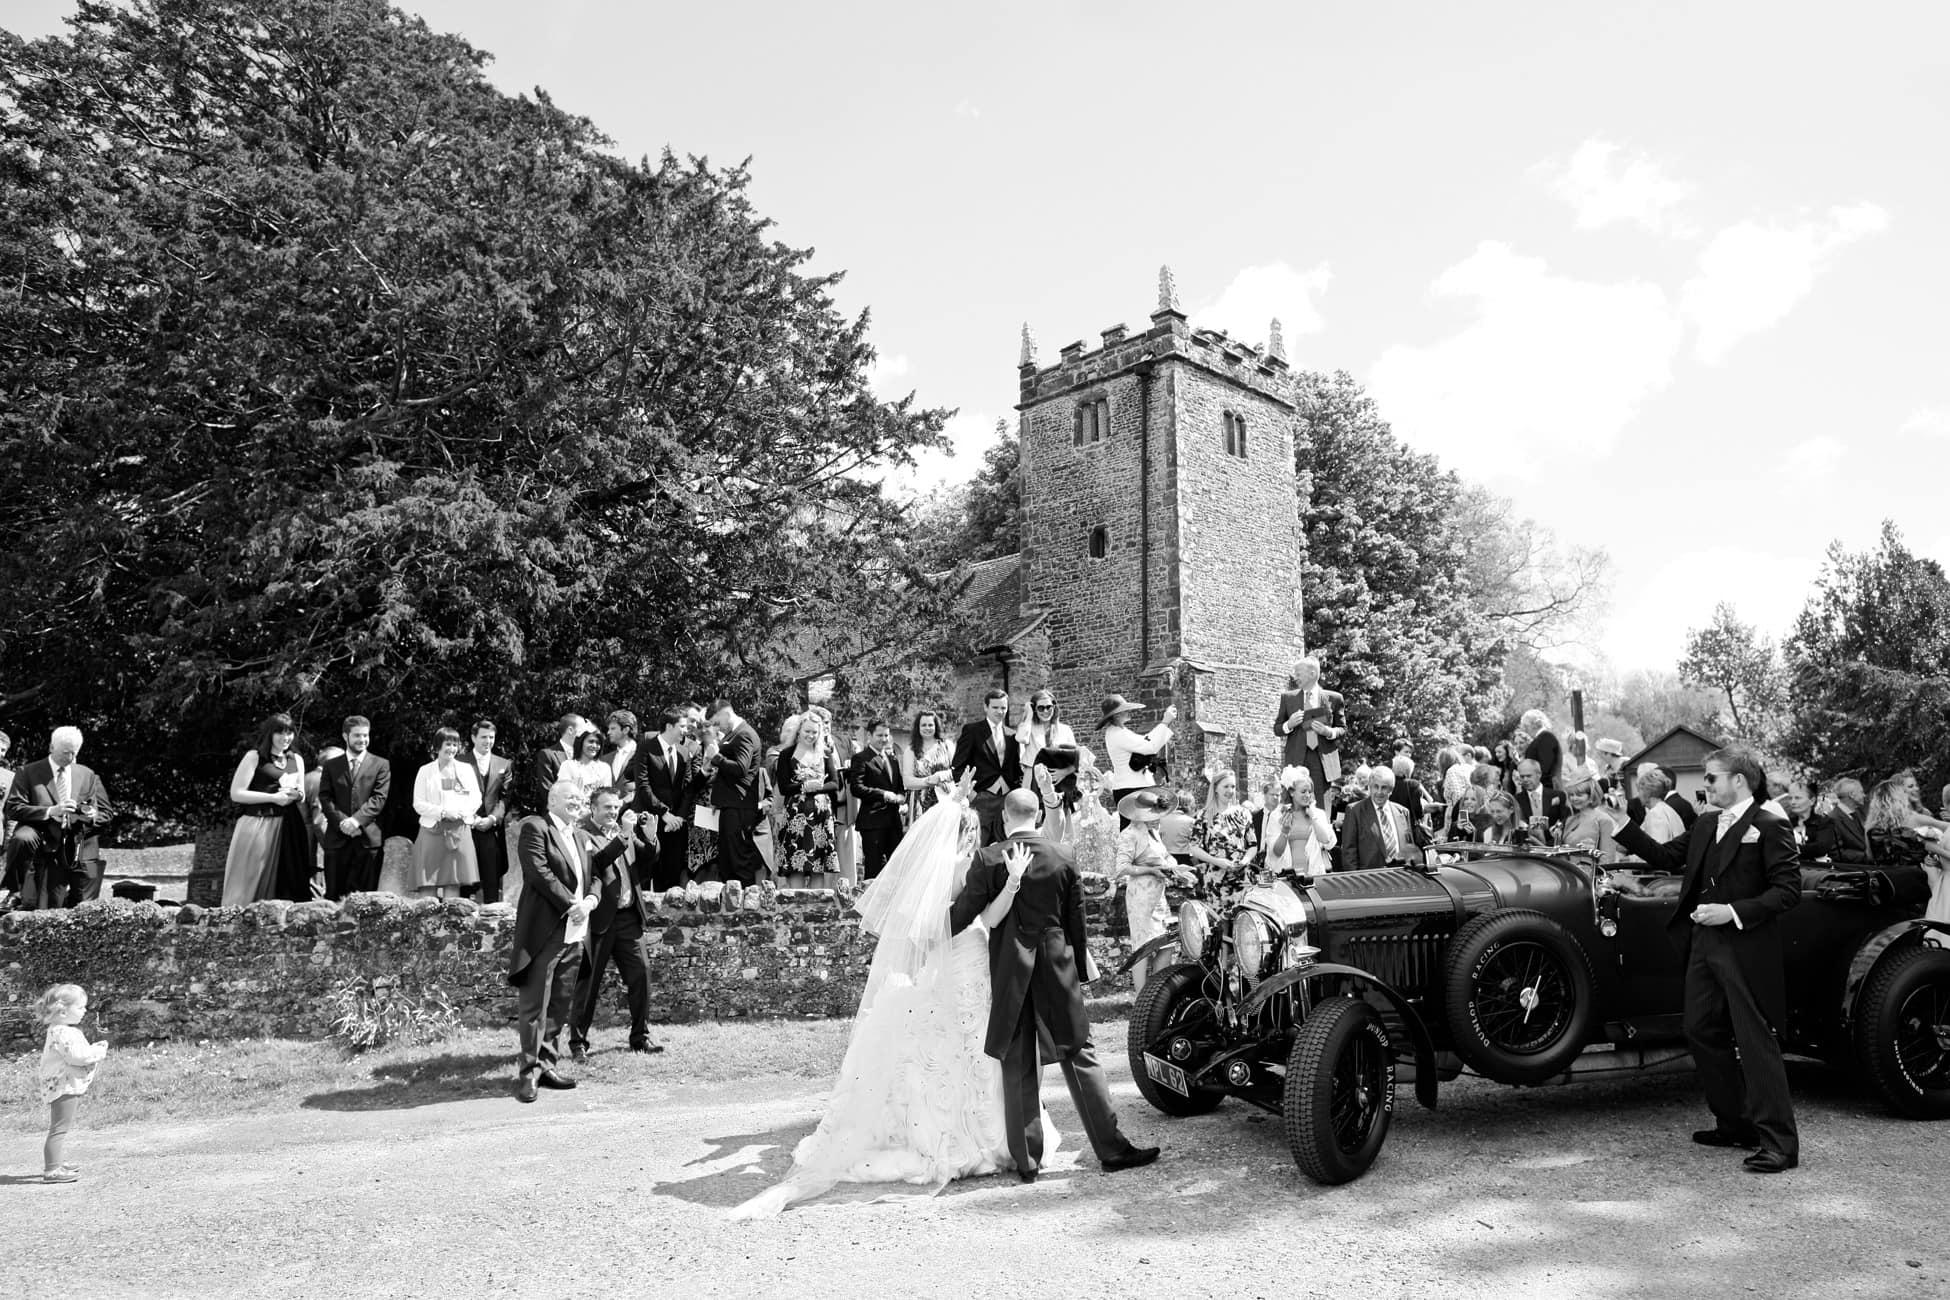 archetypical-english-wedding-scene